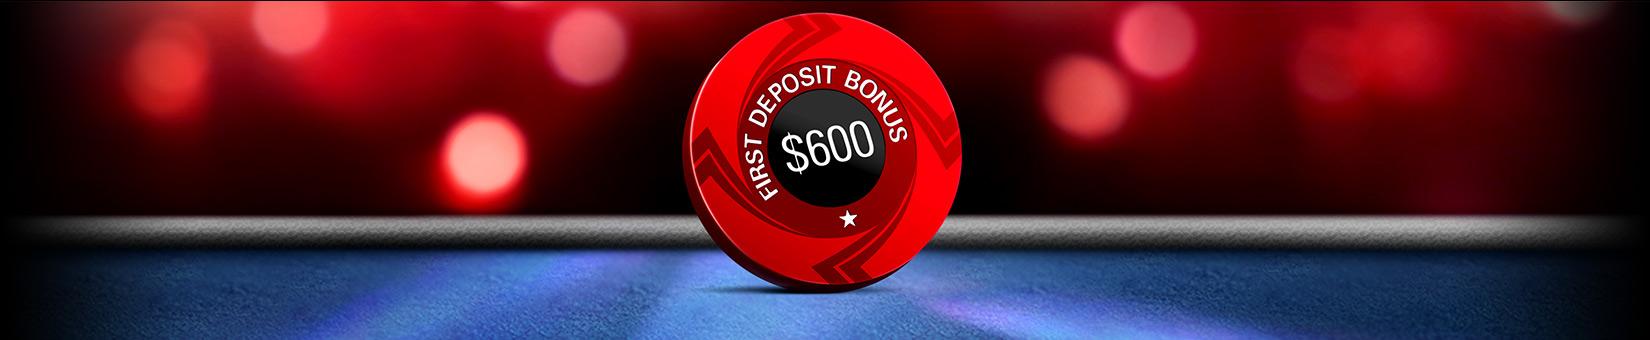 Slot Promotion Code 585952